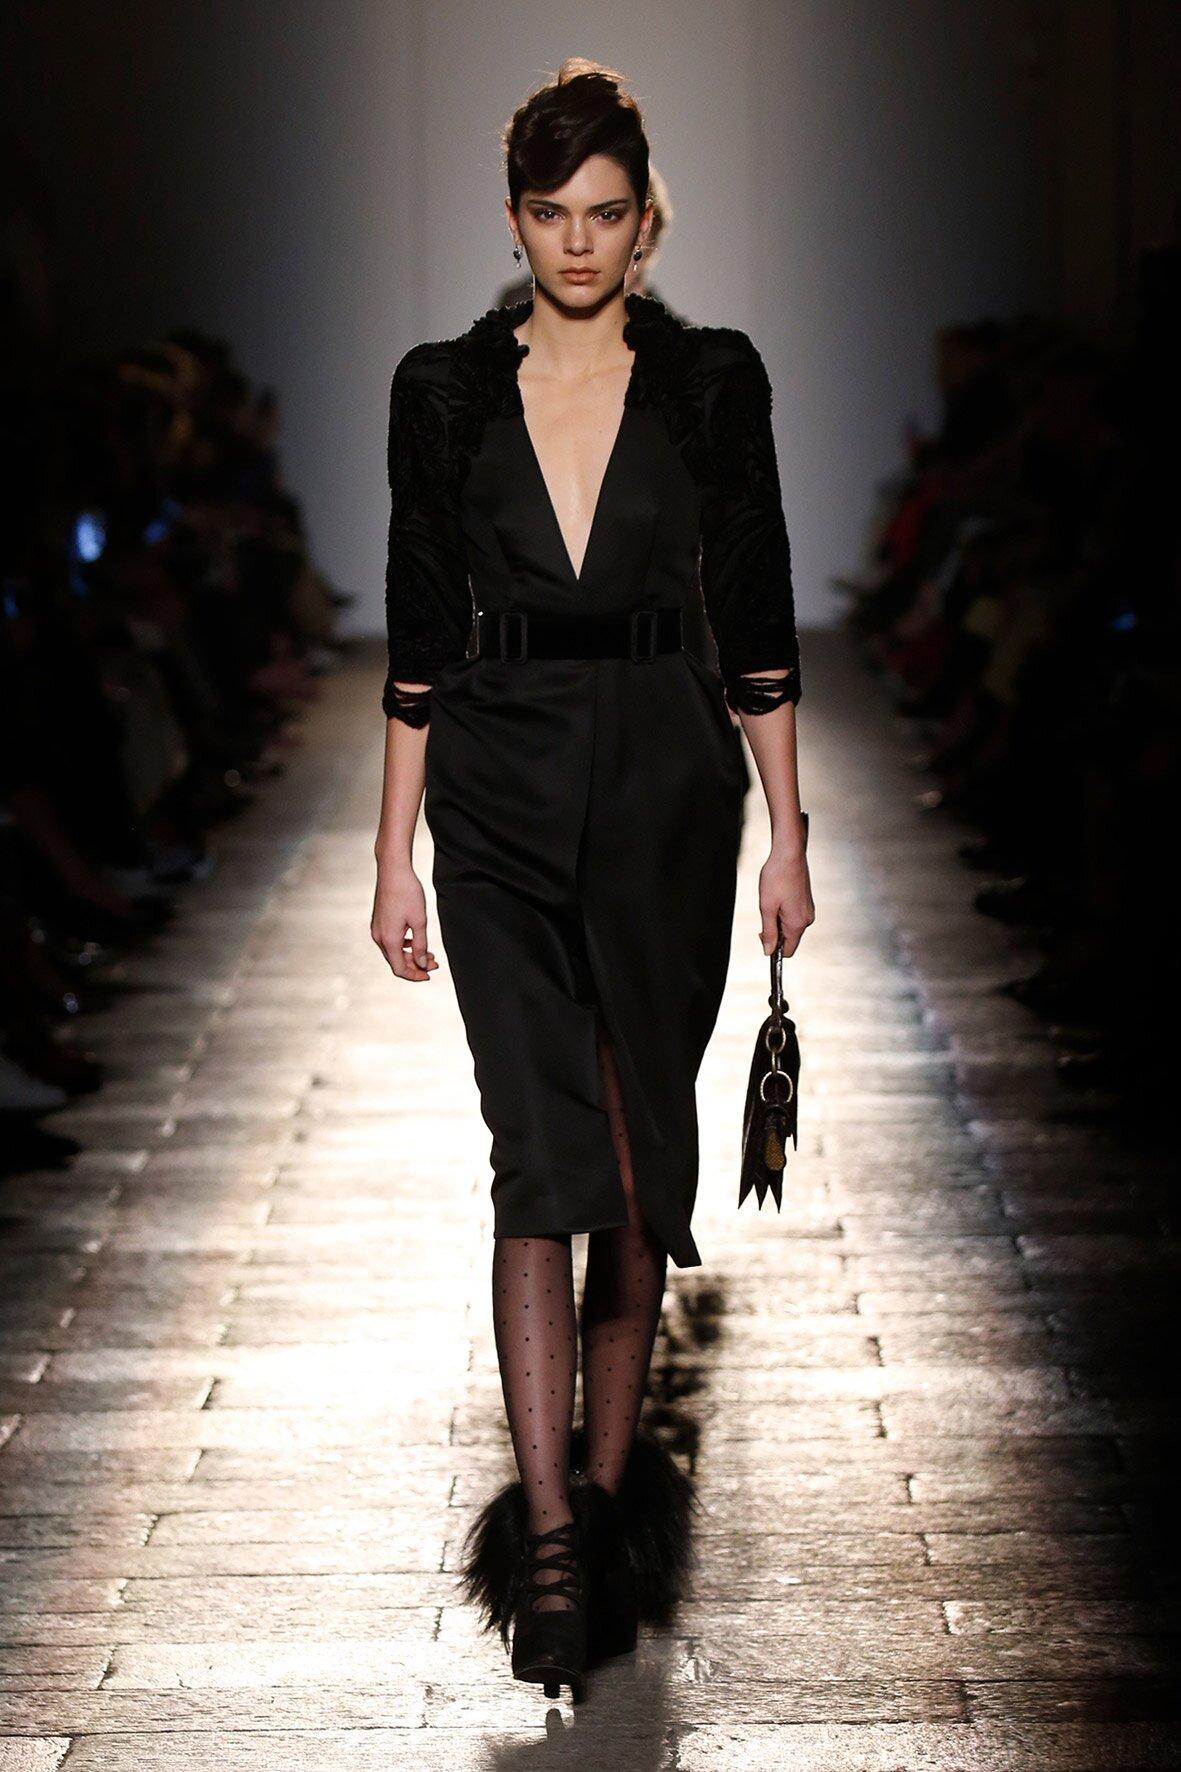 2017 Bottega Veneta Fall Catwalk